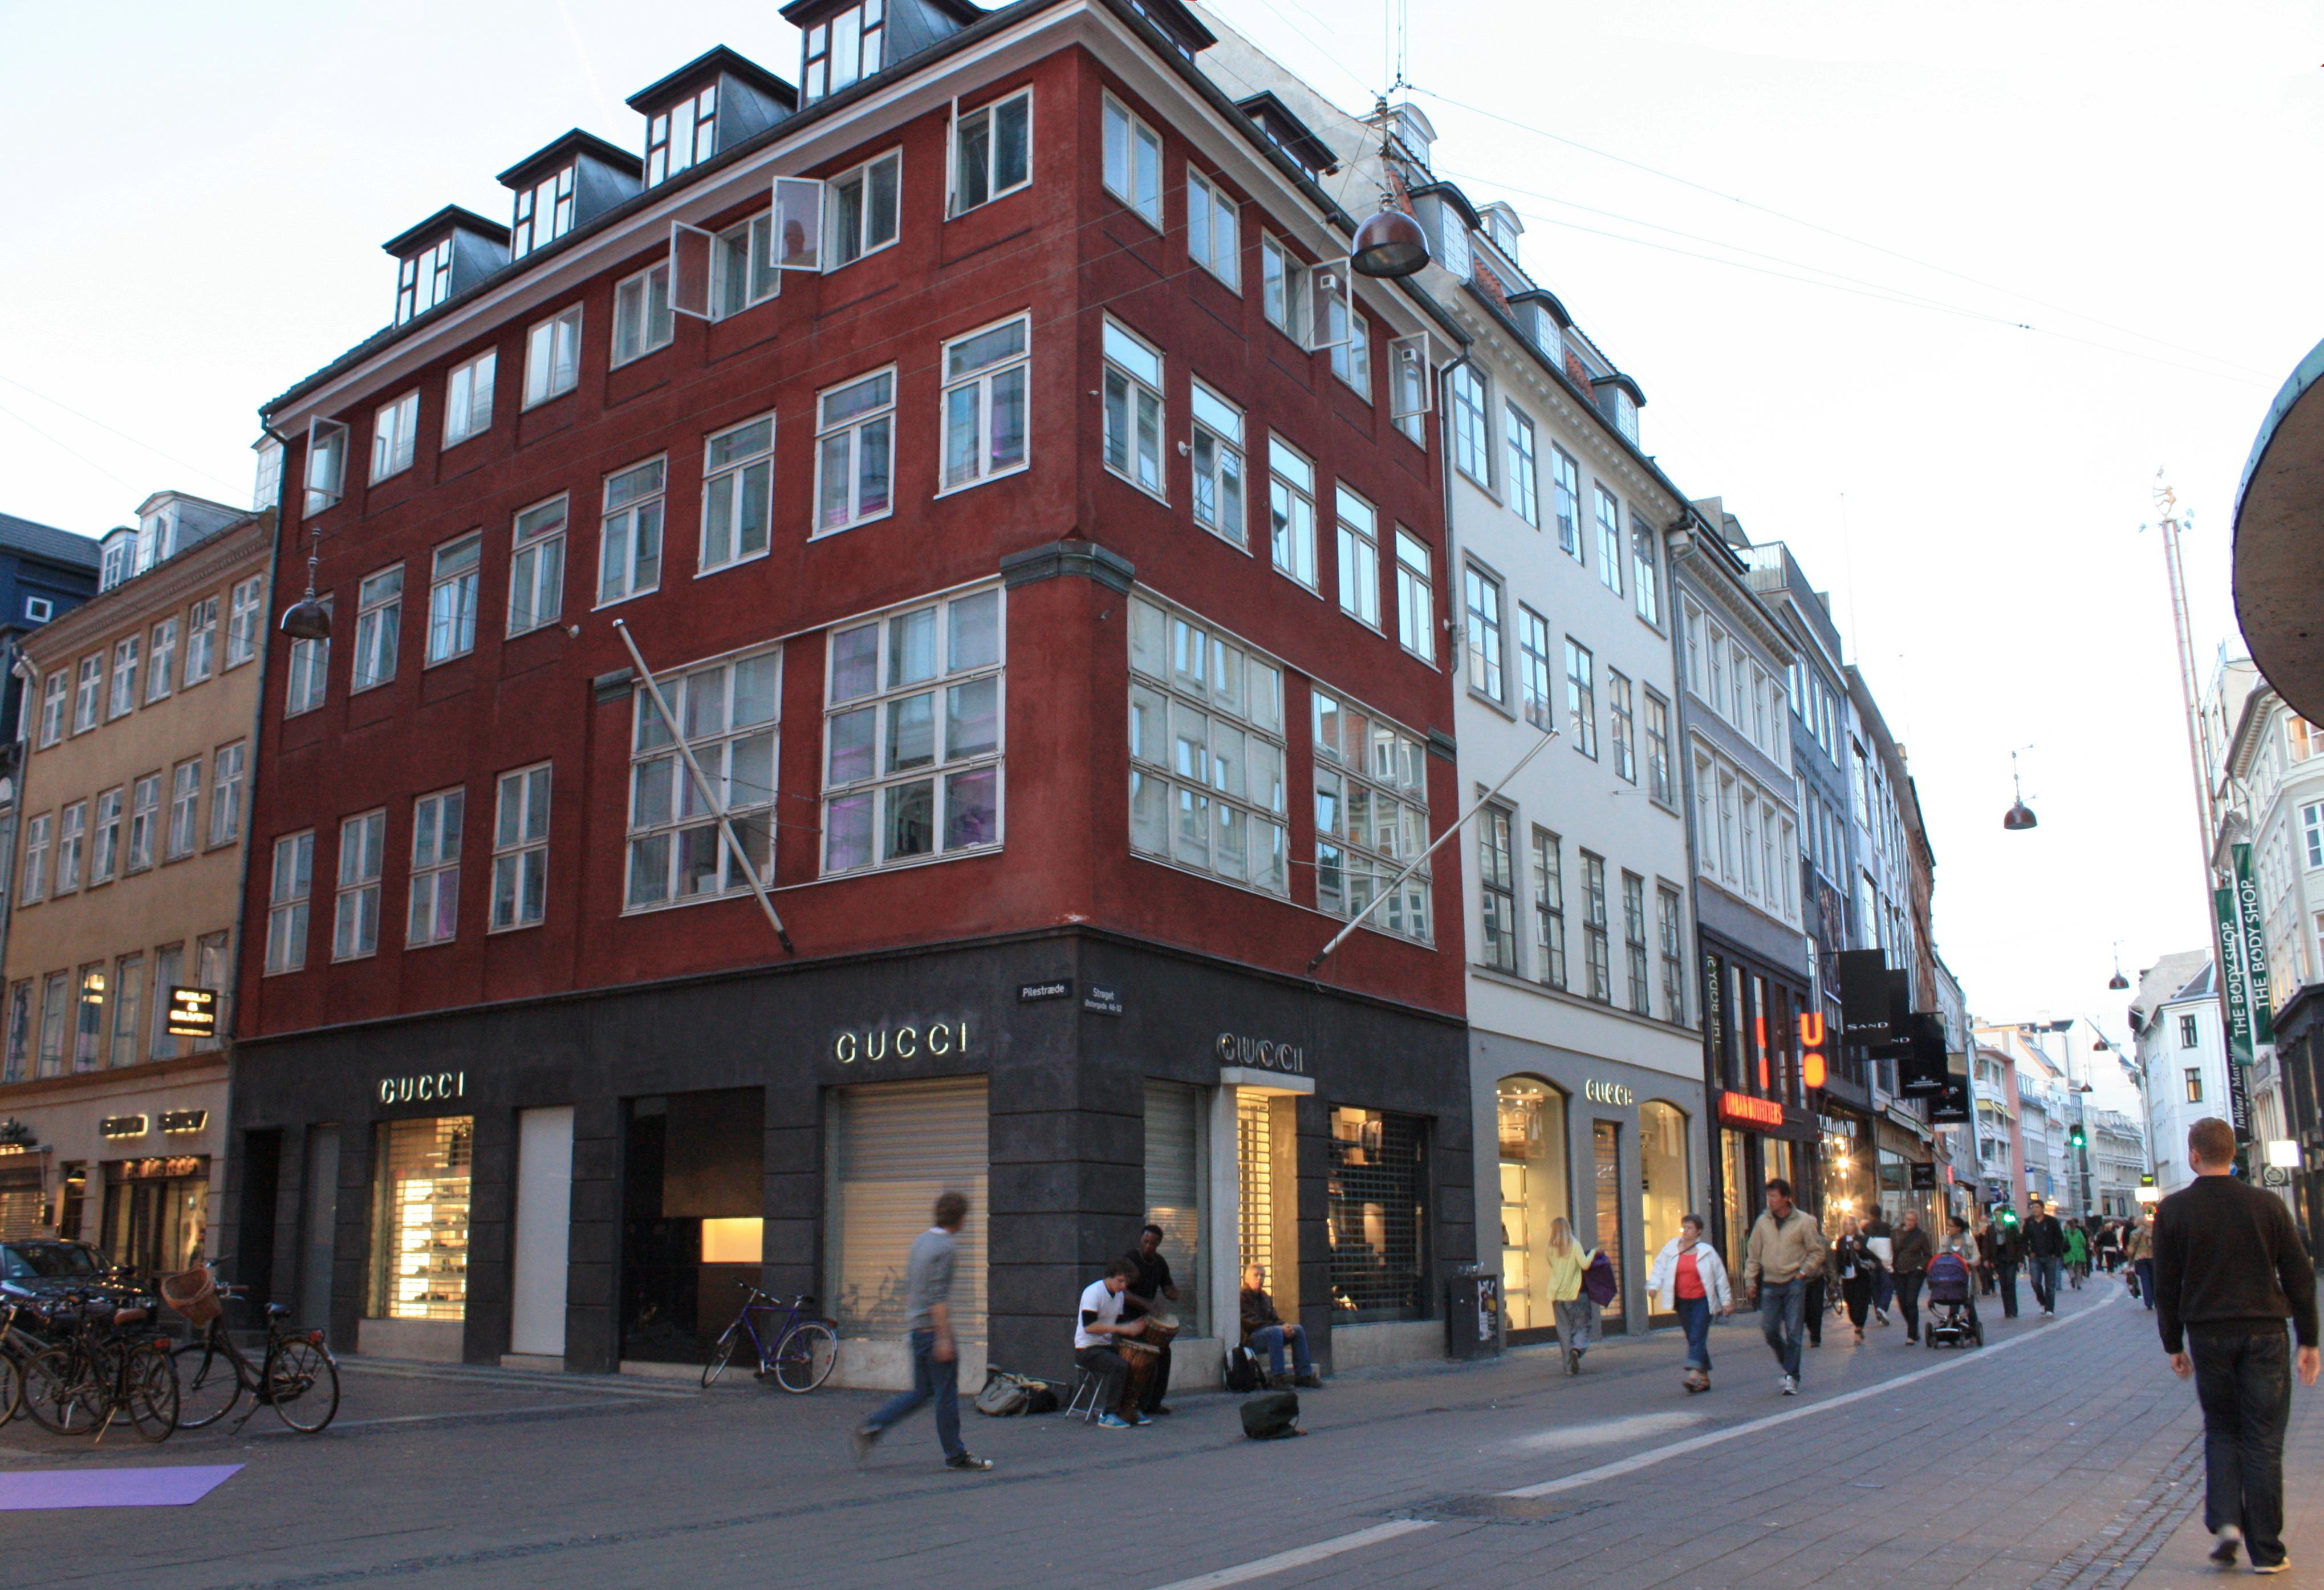 bd41422fed3 File Strøget - Gucci shop IM8165 C.JPG - Wikimedia Commons